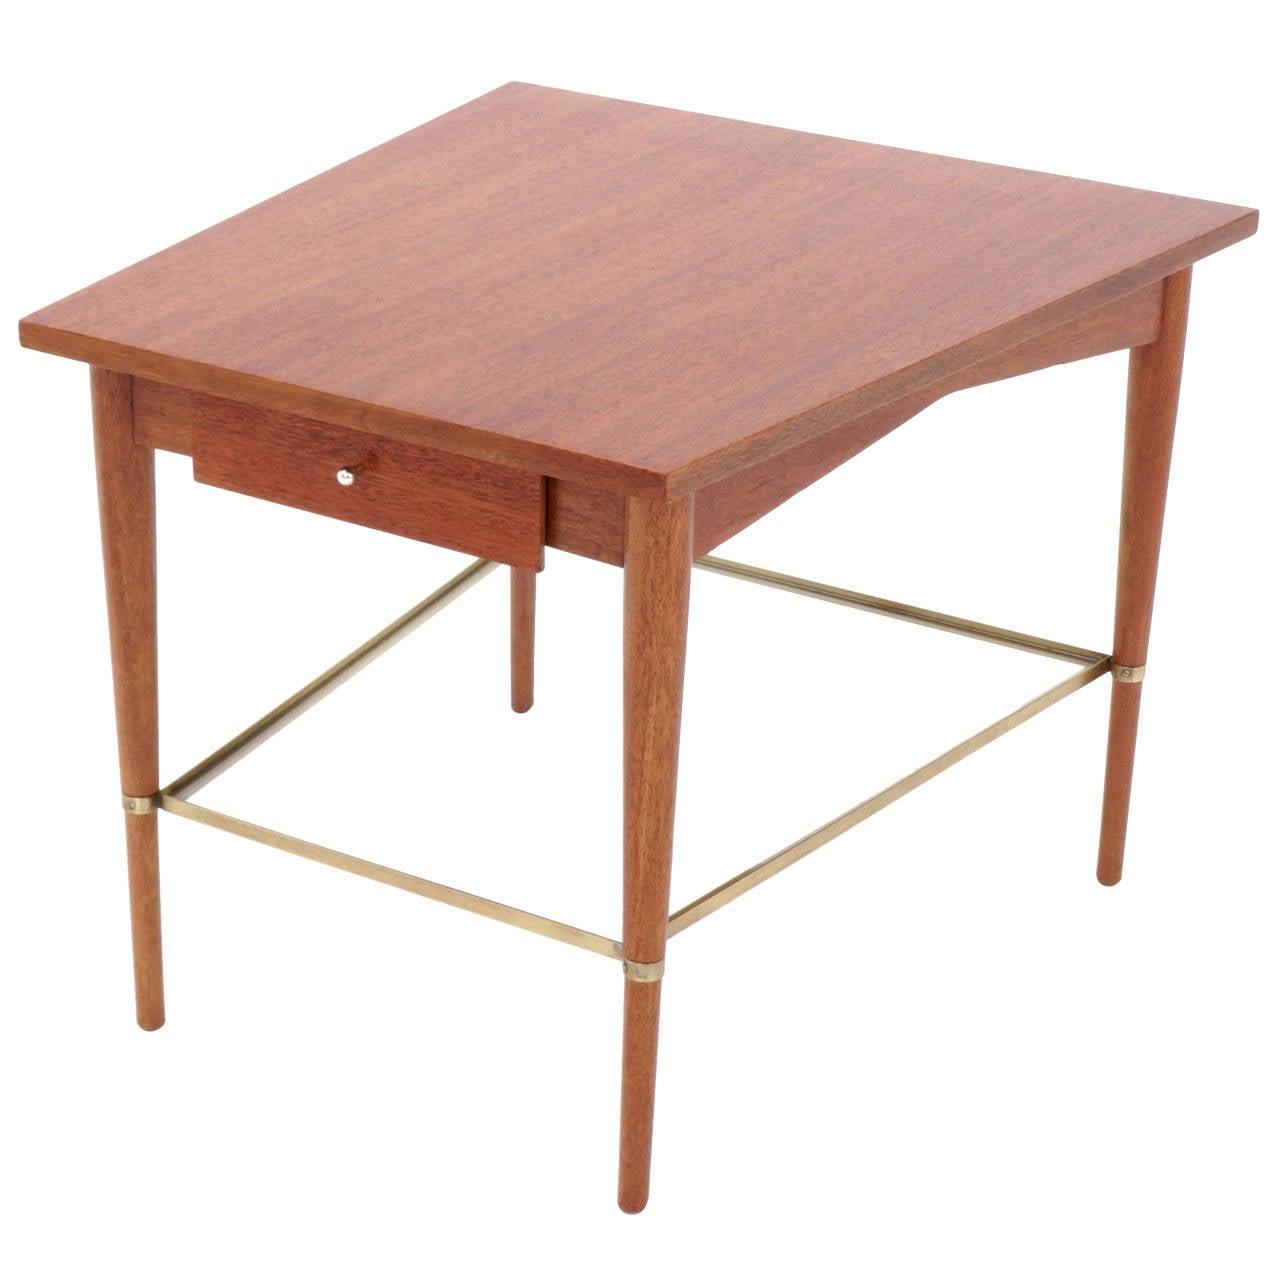 Rare Paul McCobb Trapezoidal Side or End Table.